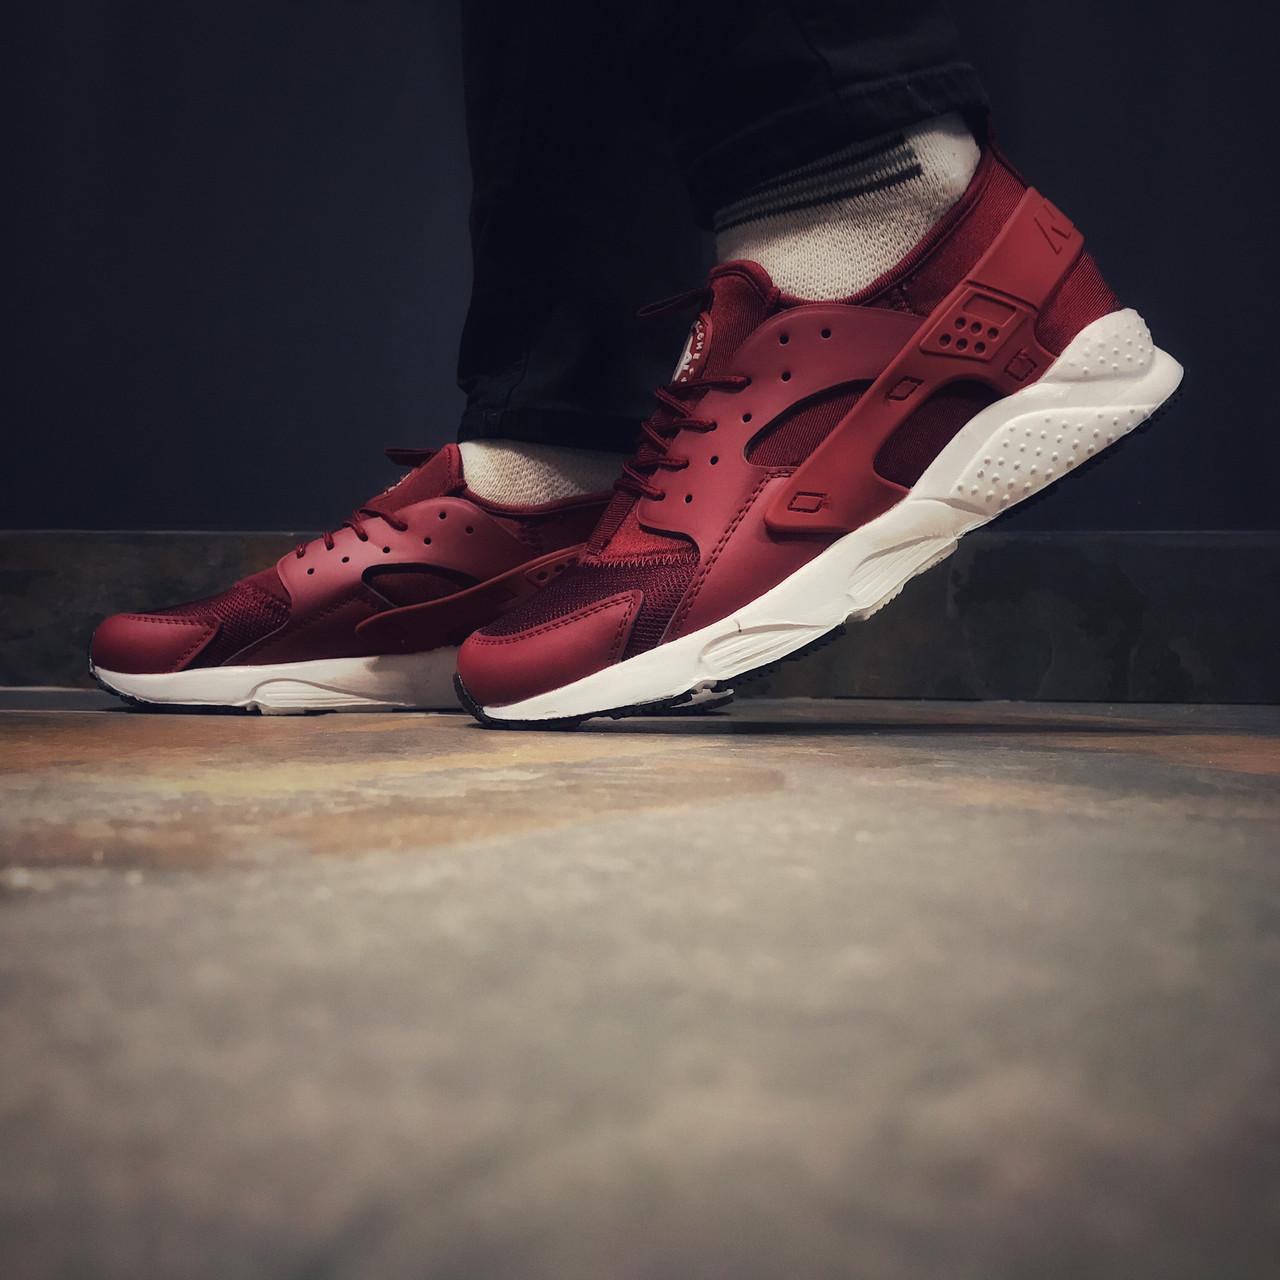 Кроссовки мужские в стиле Nike Huarache бордовые